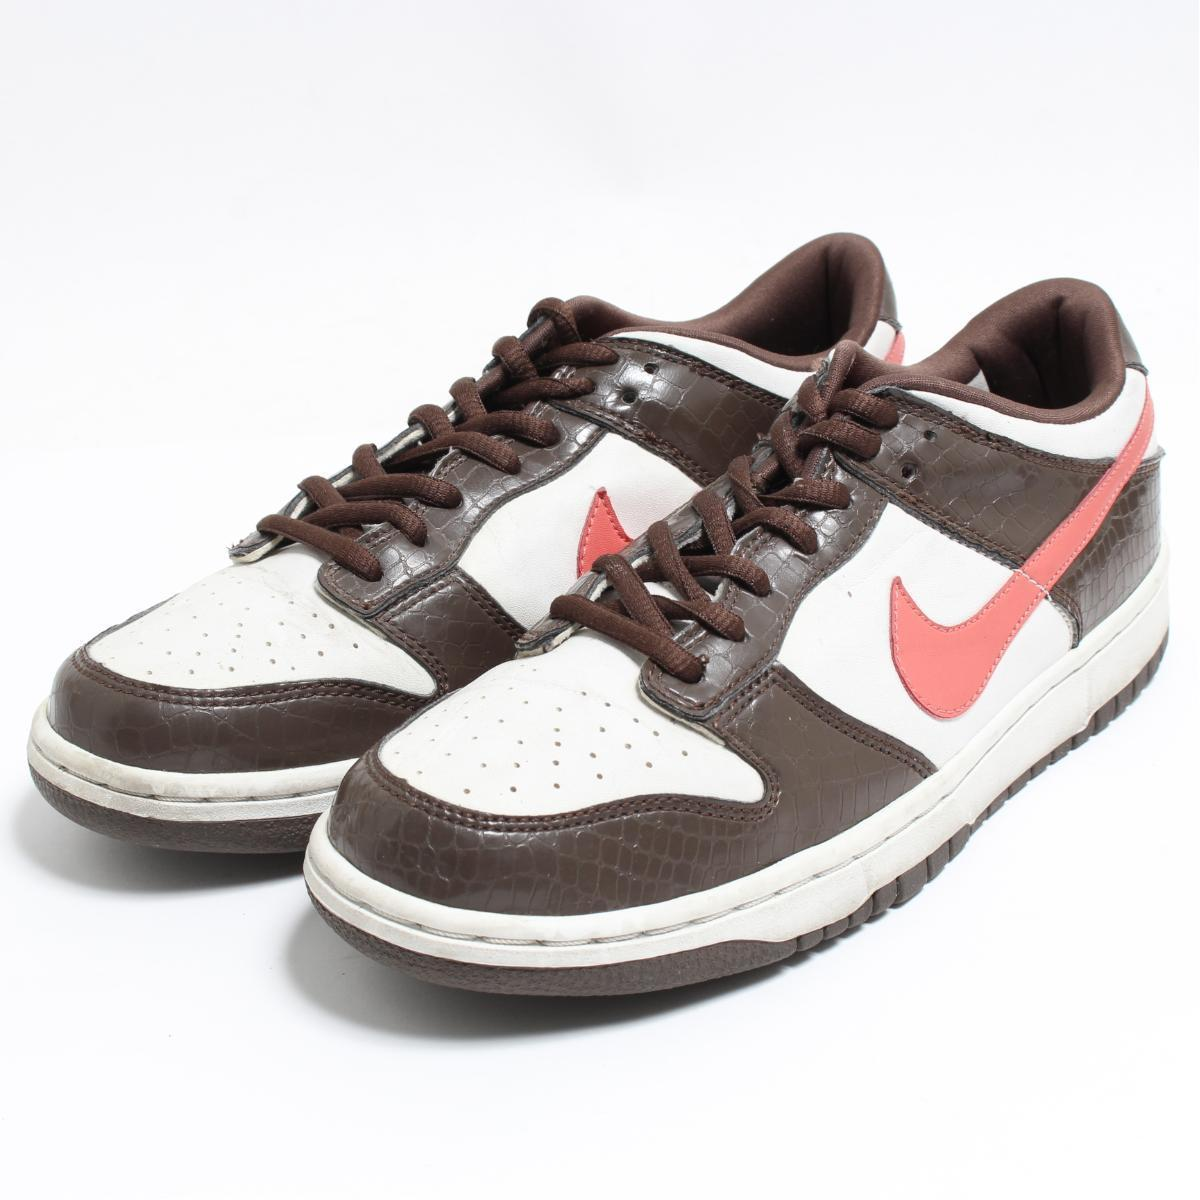 get cheap de39f f78c6 Nike NIKE DUNK LOW dunk low sneakers US6.5Y Lady's 24.5cm /boo8212